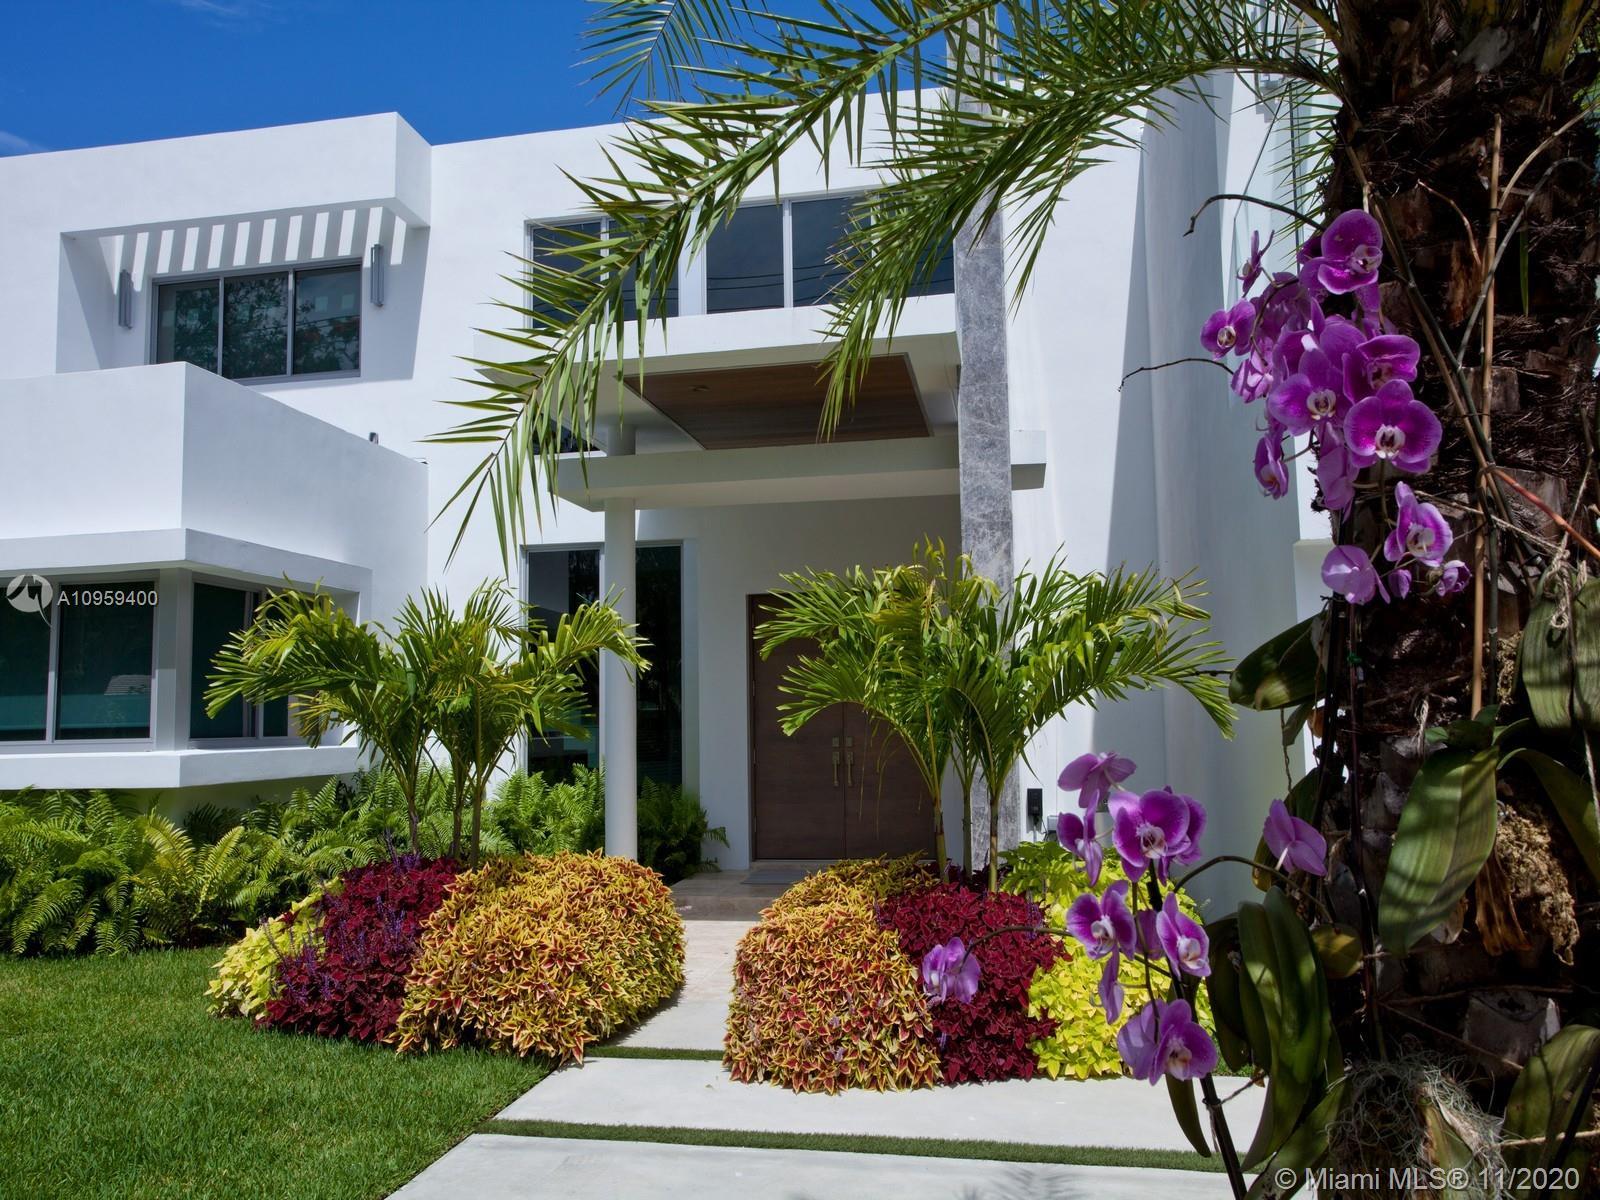 Photo - 6300 CABALLERO BL, Coral Gables FL 33146